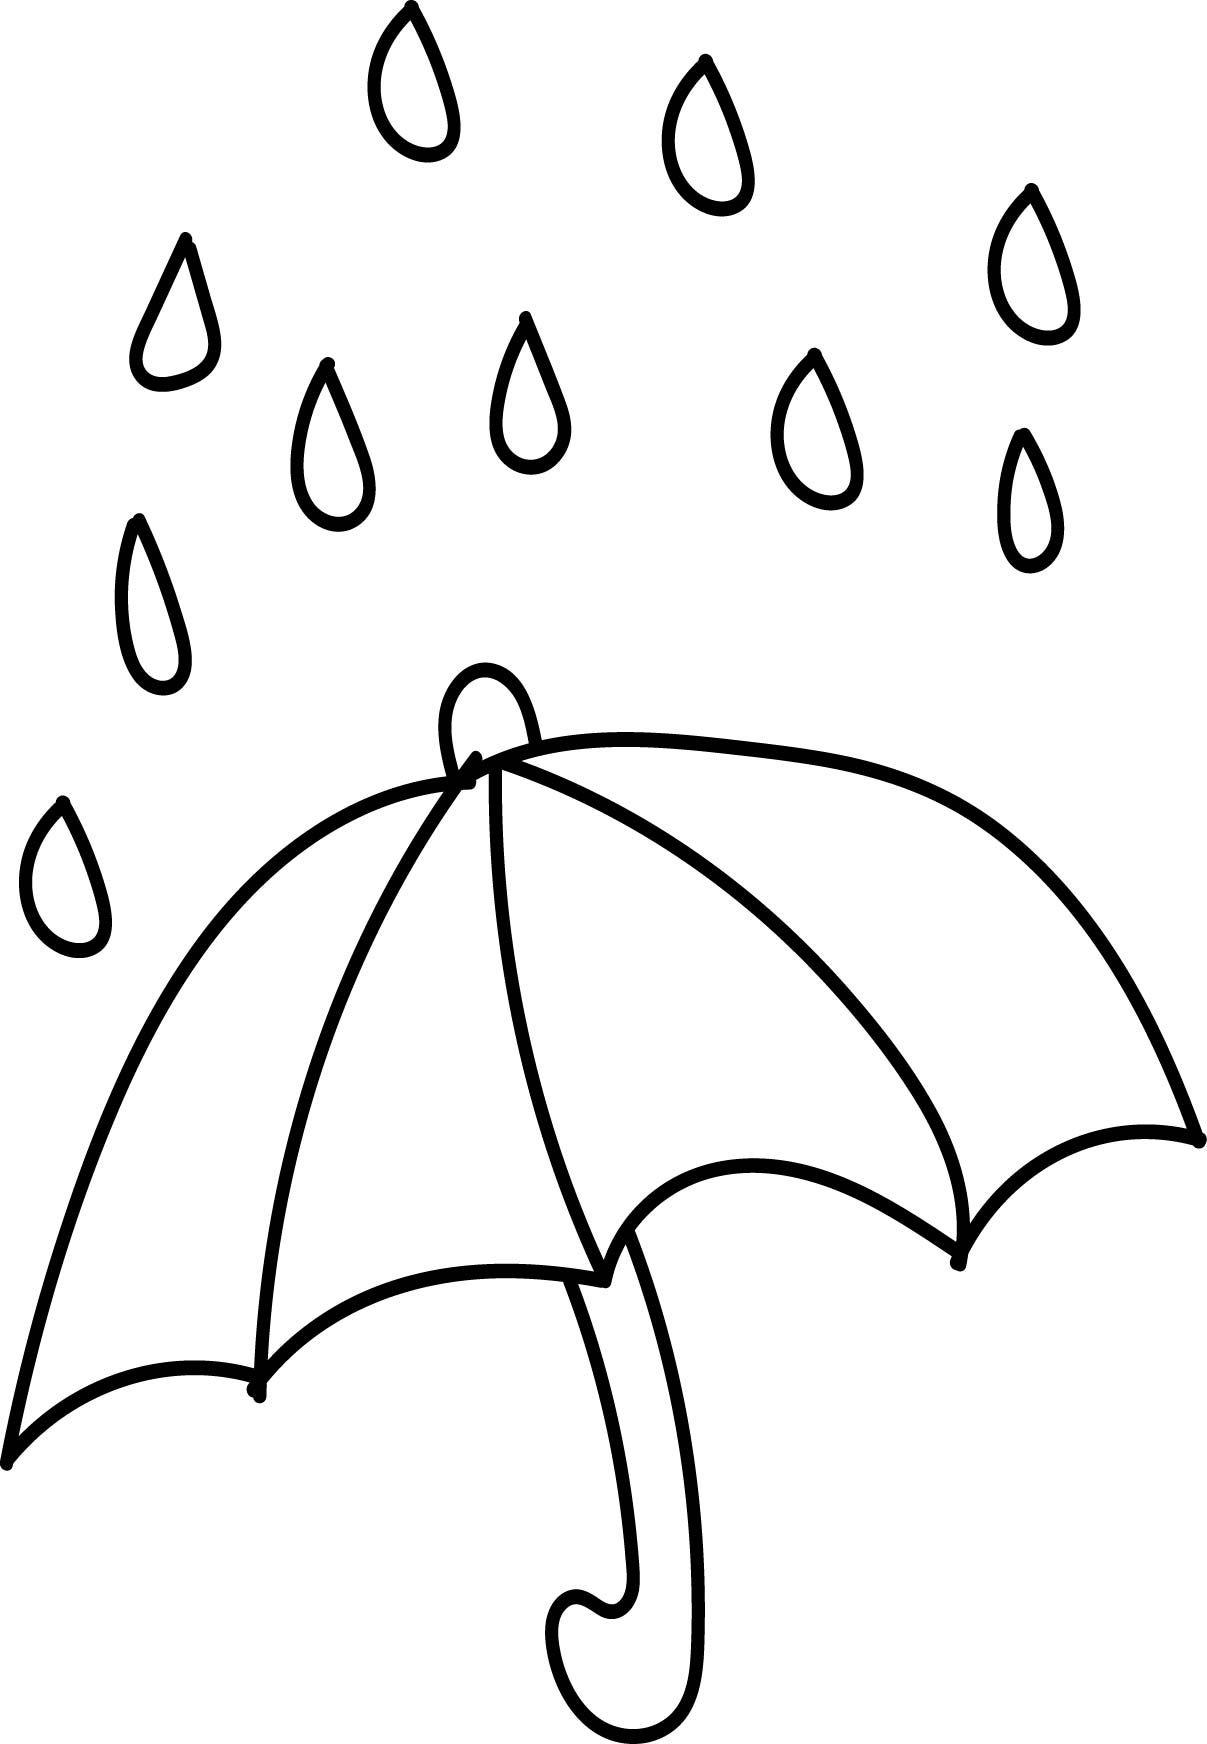 Nice Aftershock Spring Rain Umbrella Free April Coloring Page Coloring Pages Coloring Pages To Print Preschool Coloring Pages